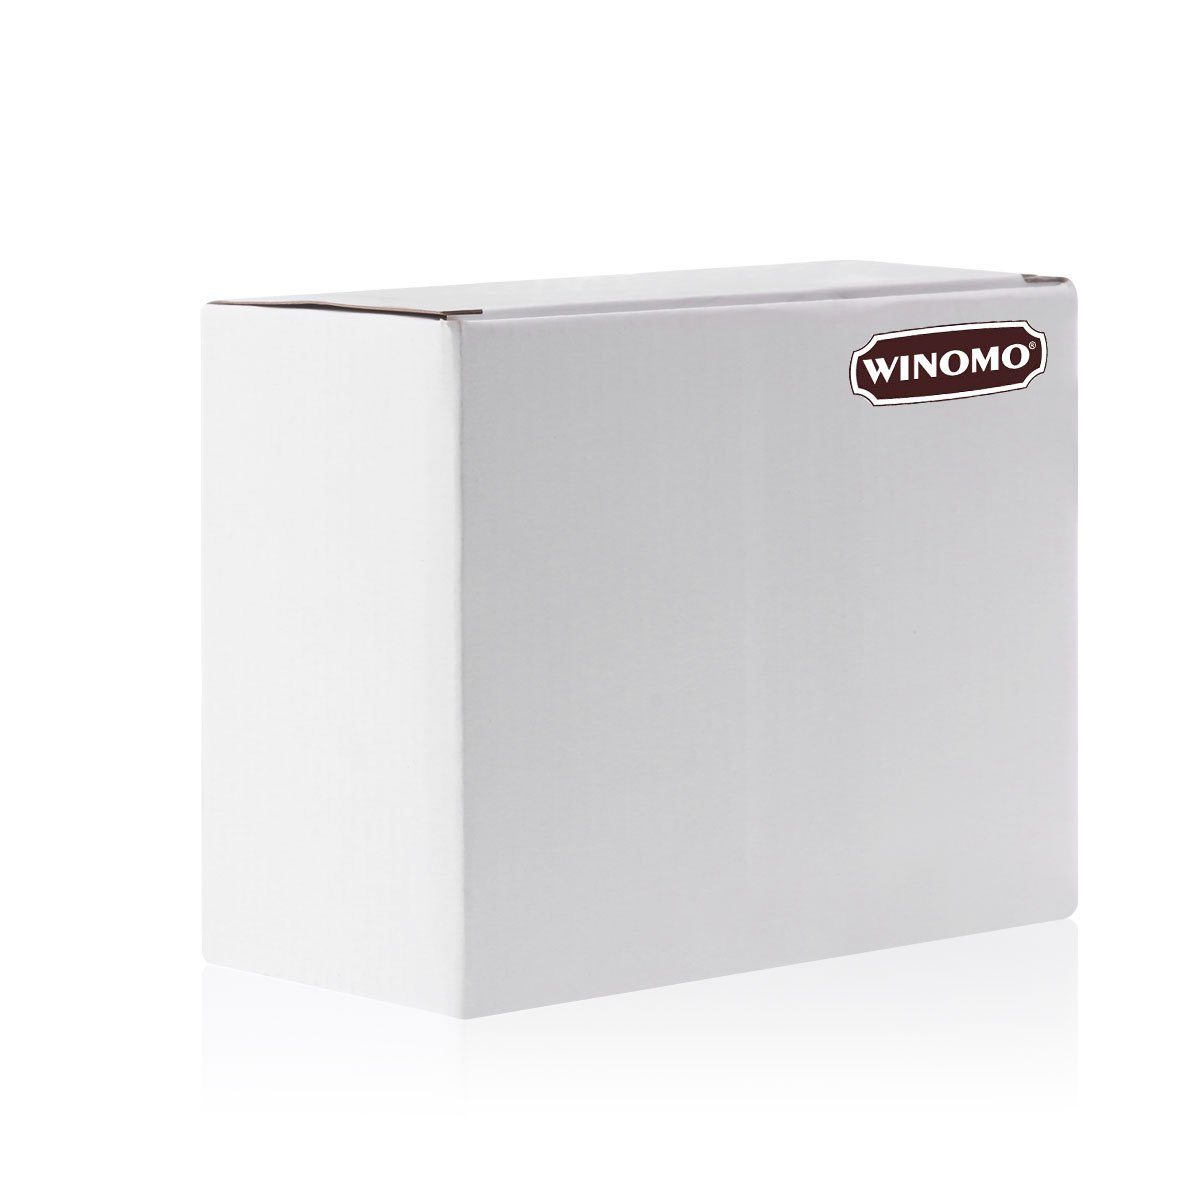 Transparent Purple Hose /& Stainless Banjos Pro Braking PBC0714-TPU-SIL Braided Clutch Line